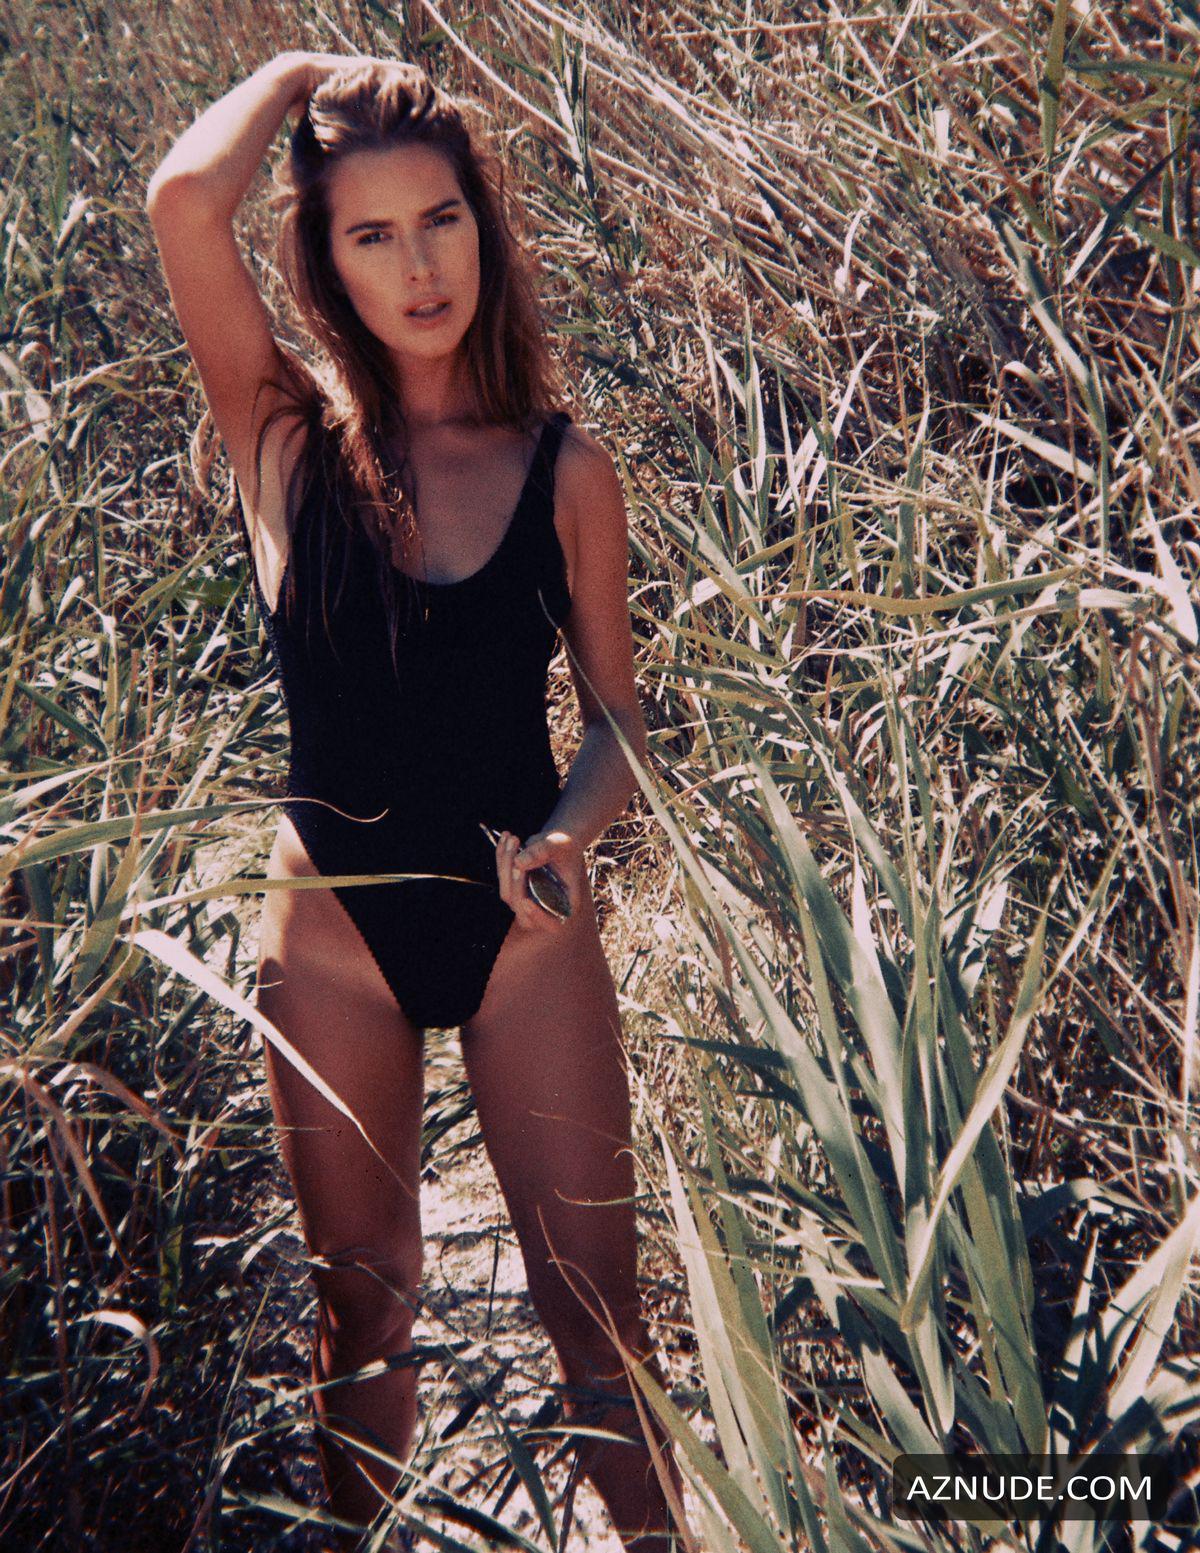 Butt Nicole Naude nudes (13 fotos) Bikini, iCloud, butt